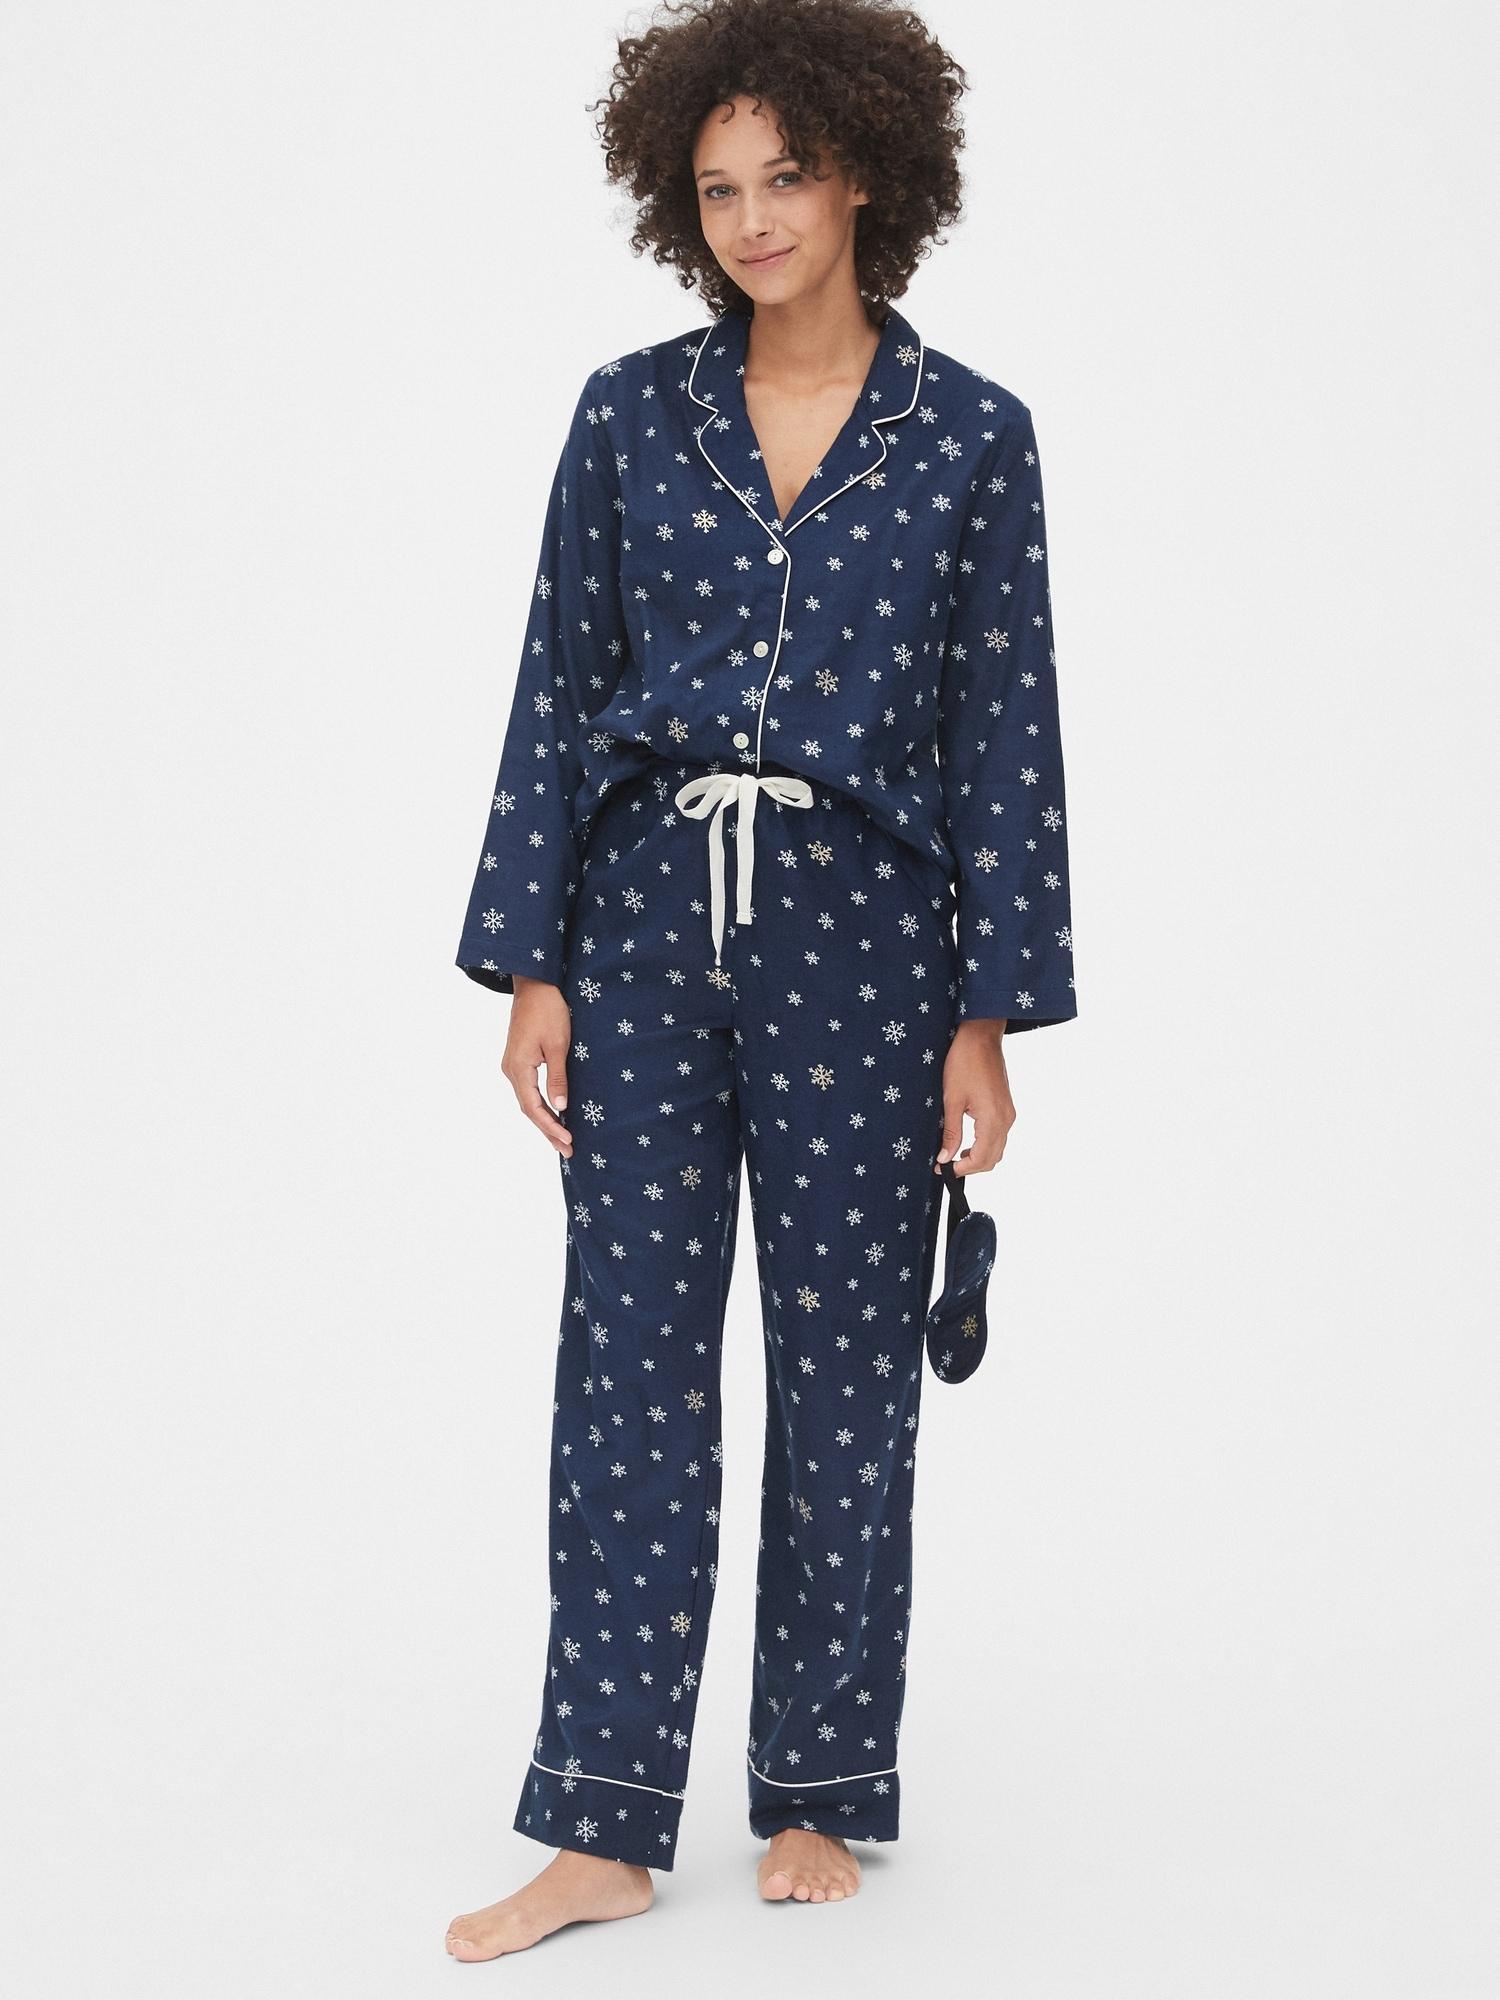 Flannel Pajama Set by Gap